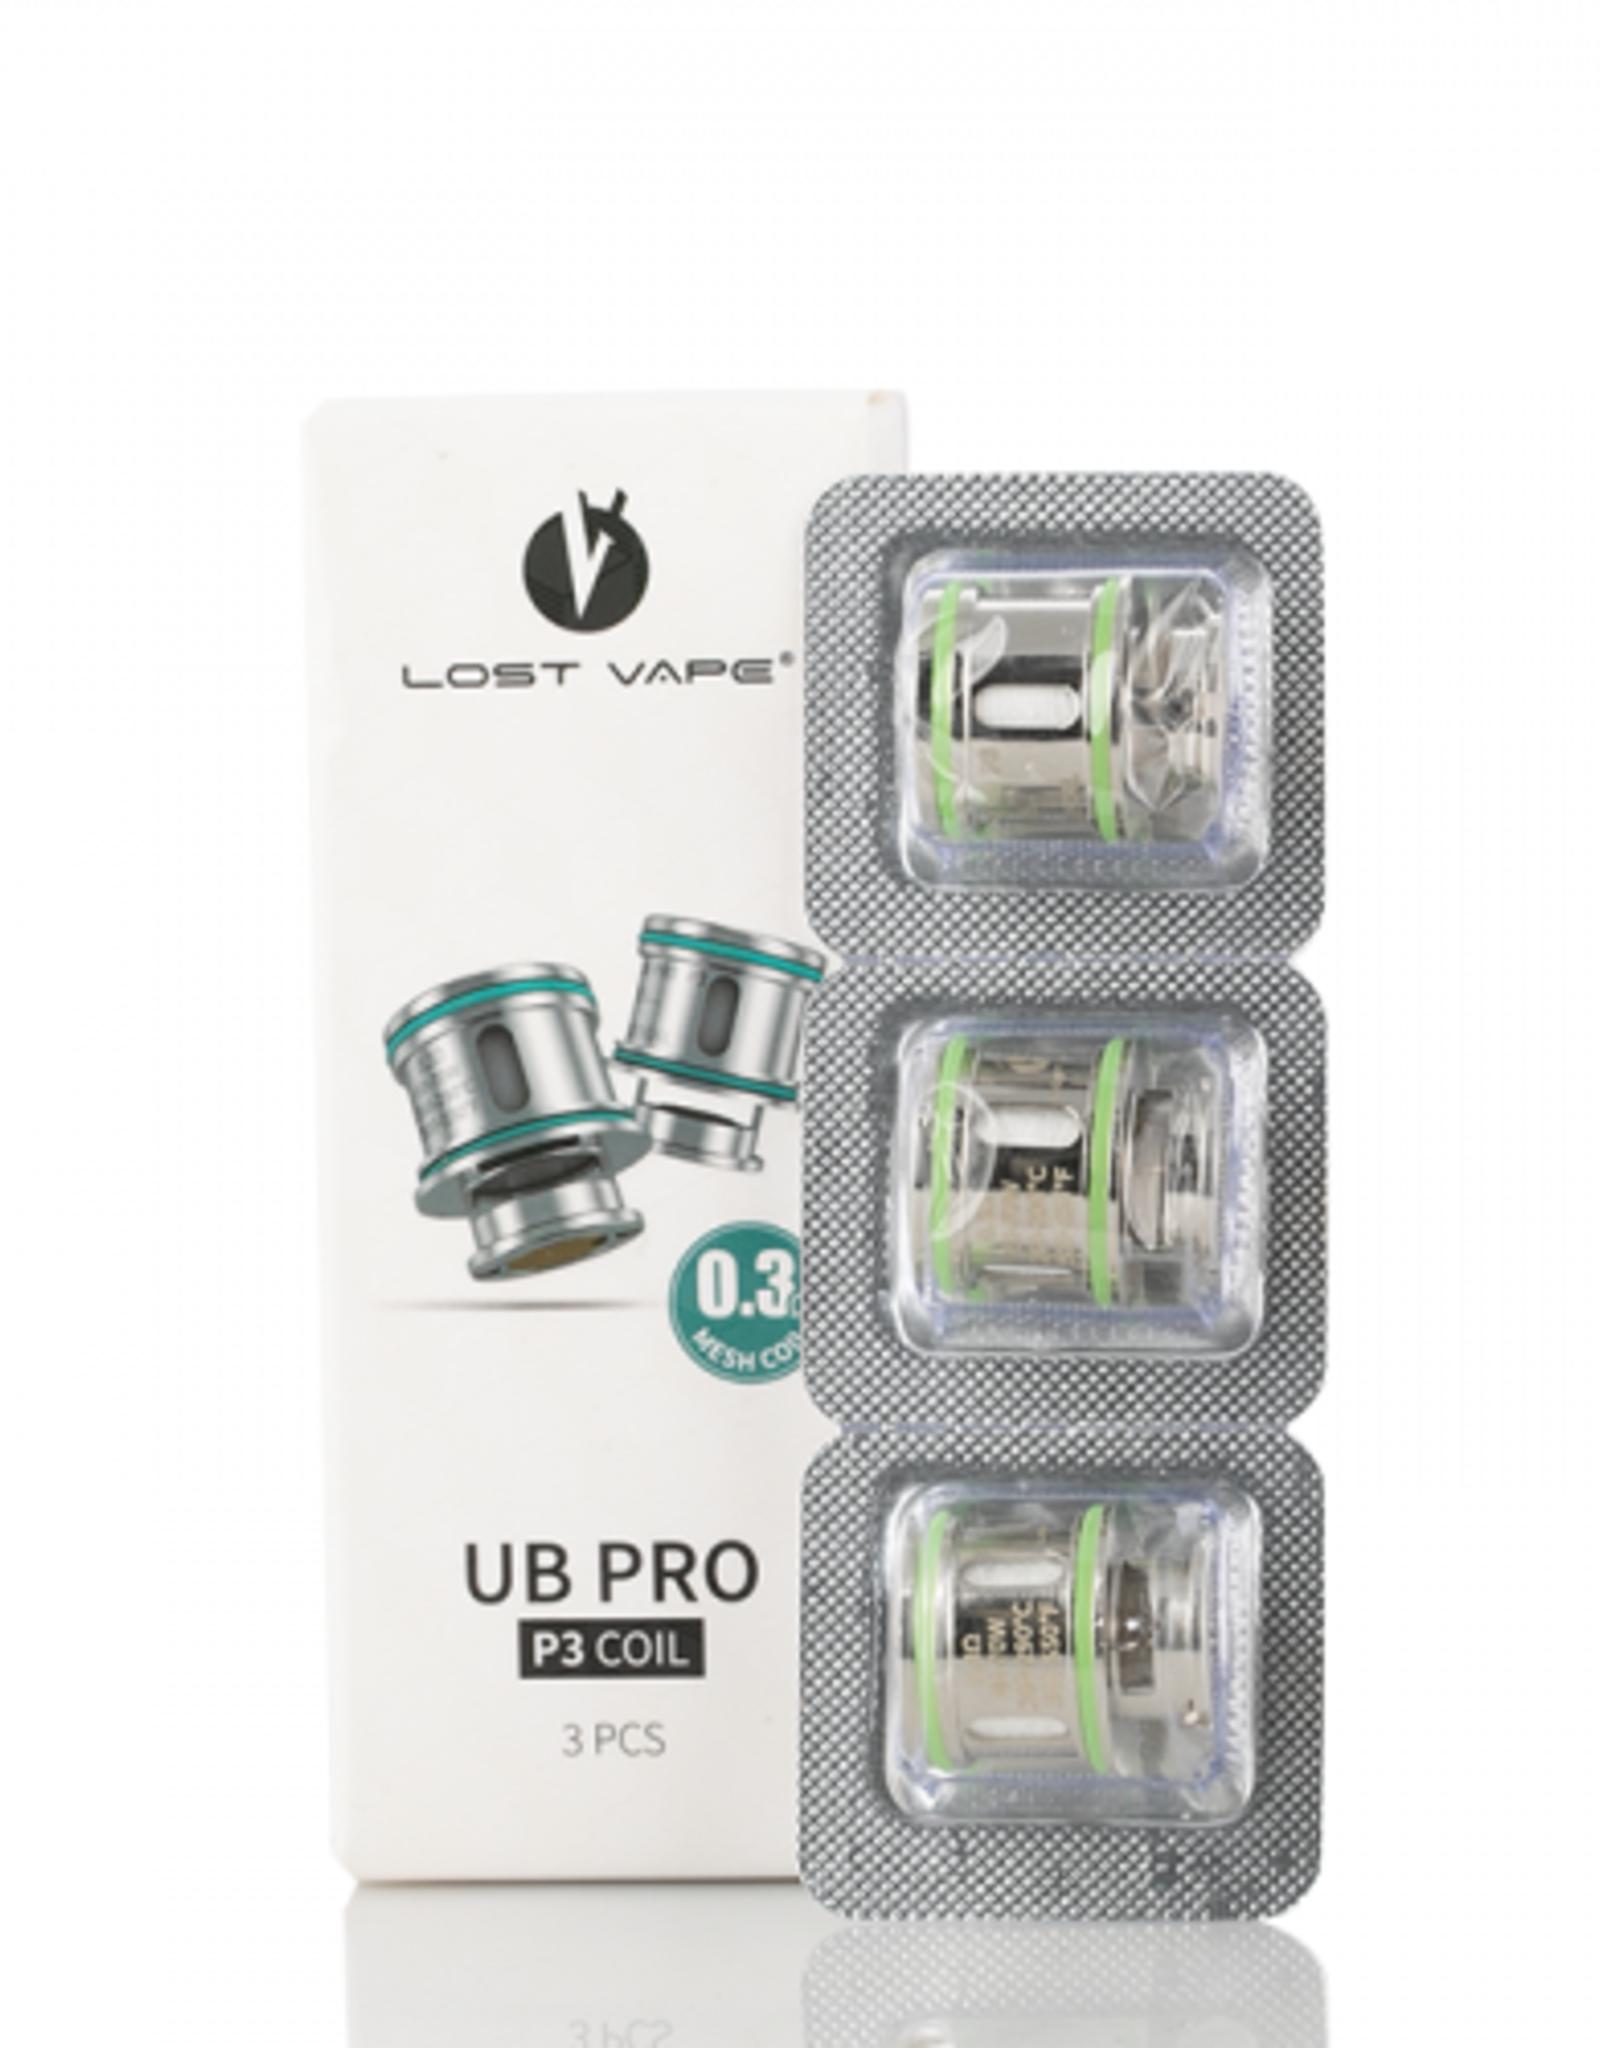 Lost Vape Lost Vape UB Pro Coils zum Ursa